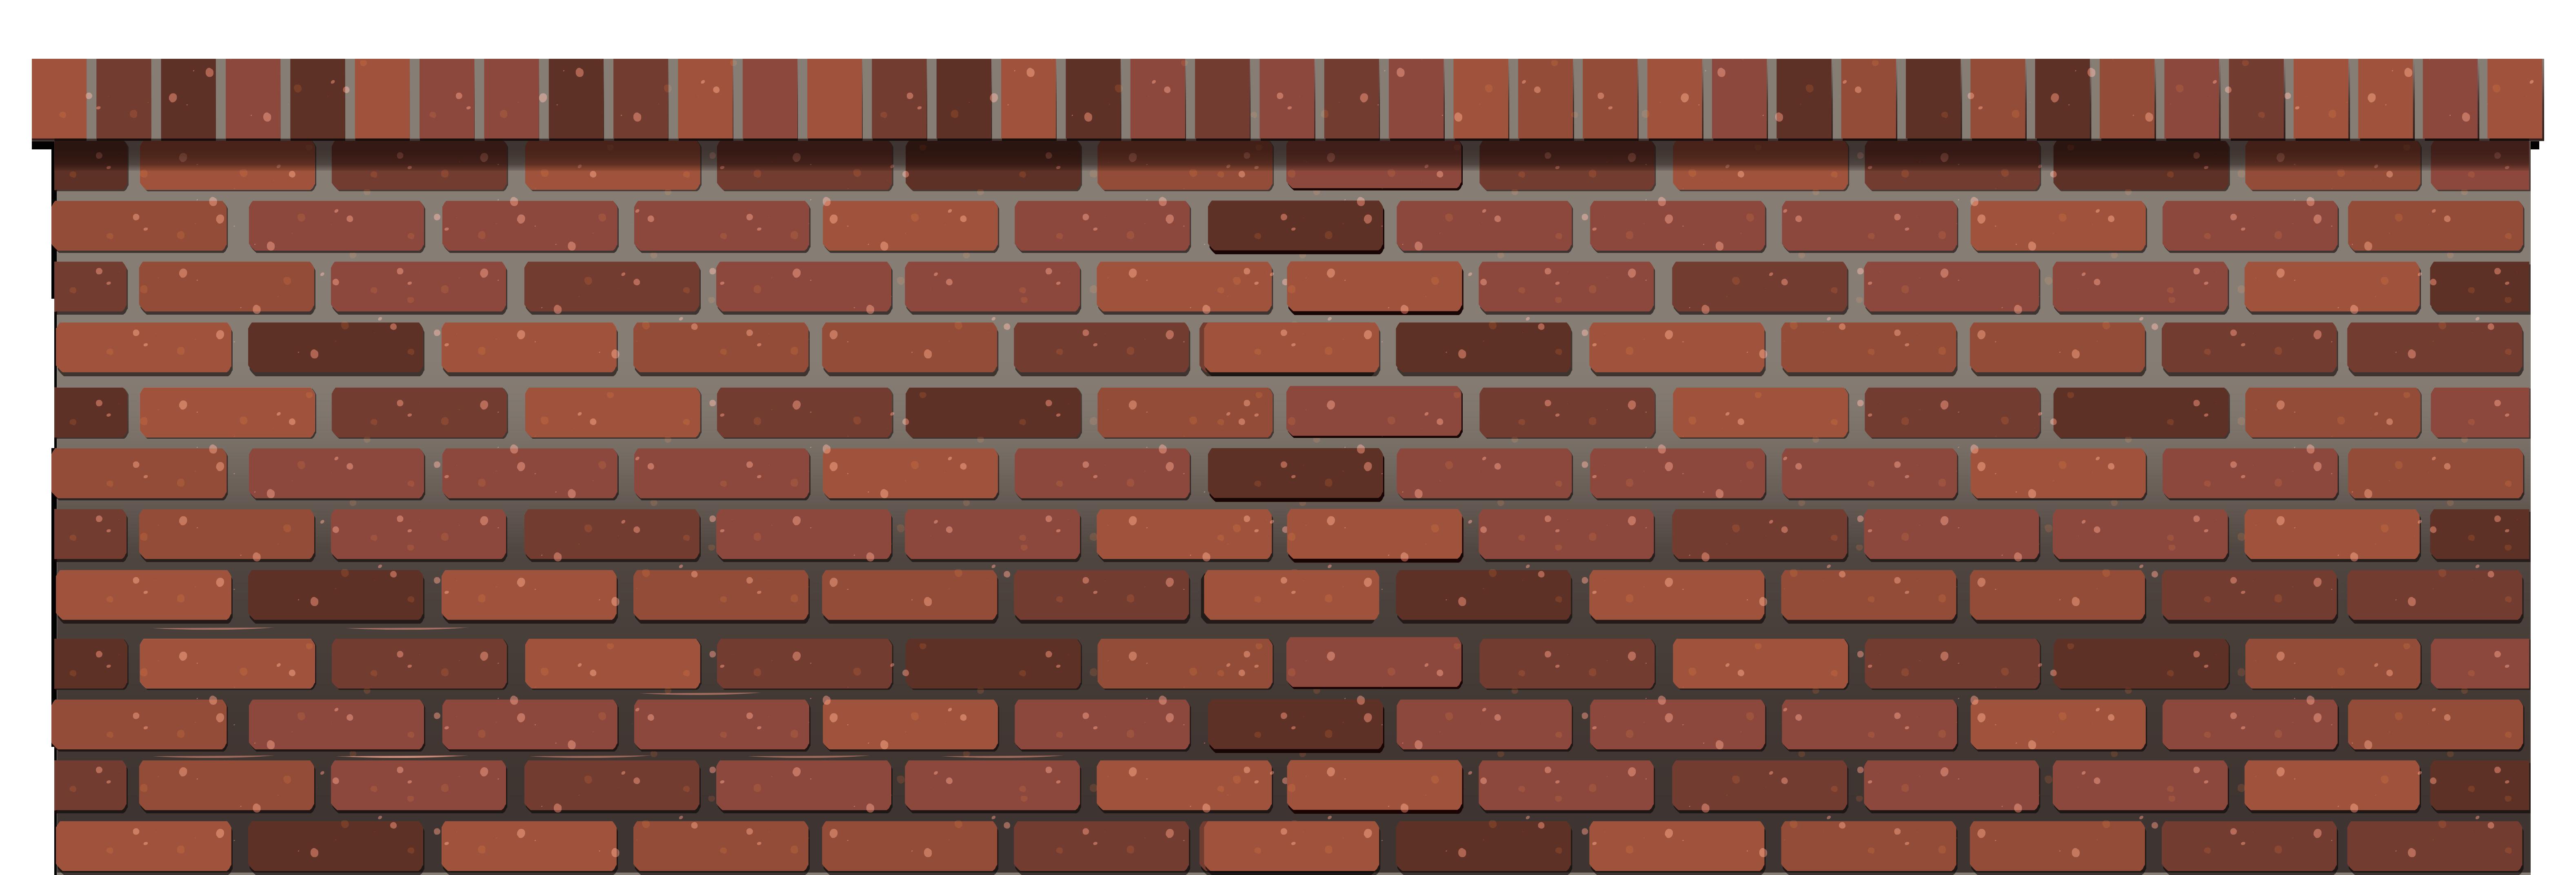 Transparent Brick Fence PNG Clipart.